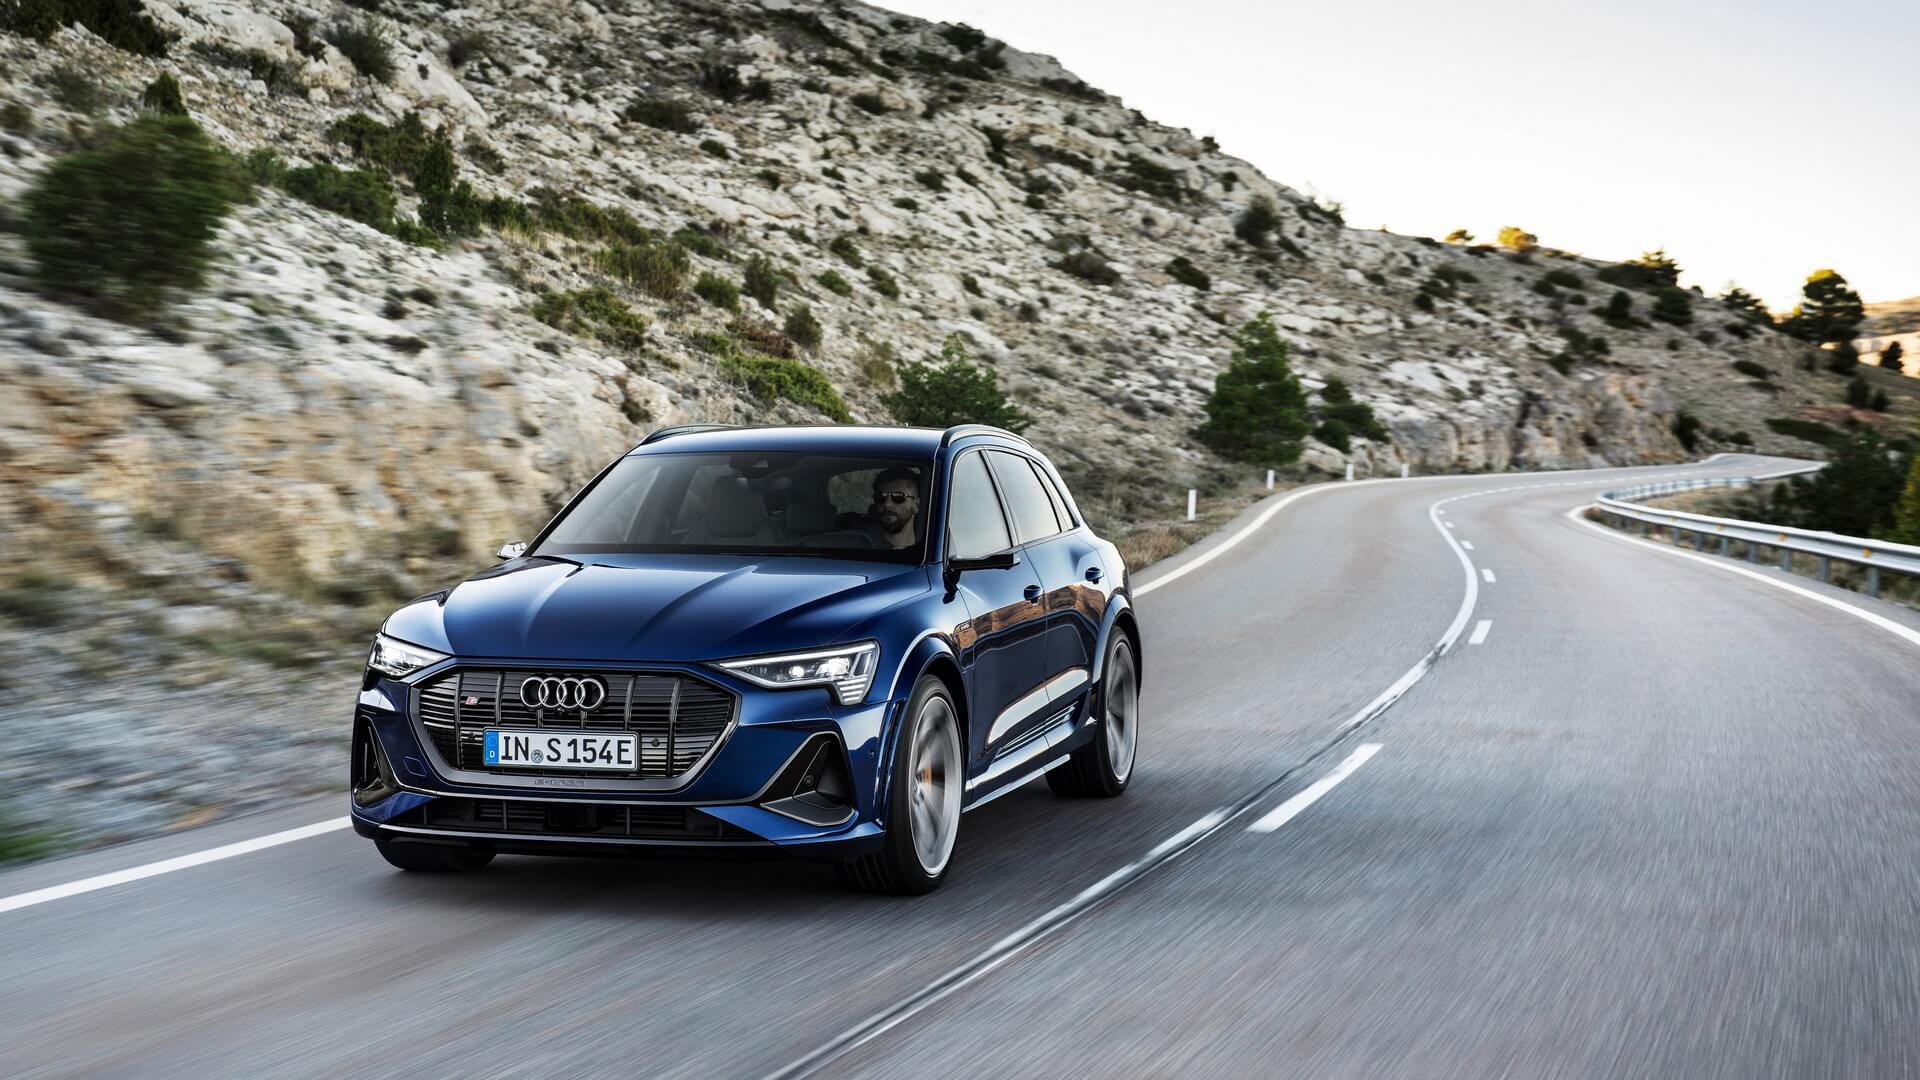 Audi-E-Tron-S-and-E-Tron-S-Sportback-2020-13